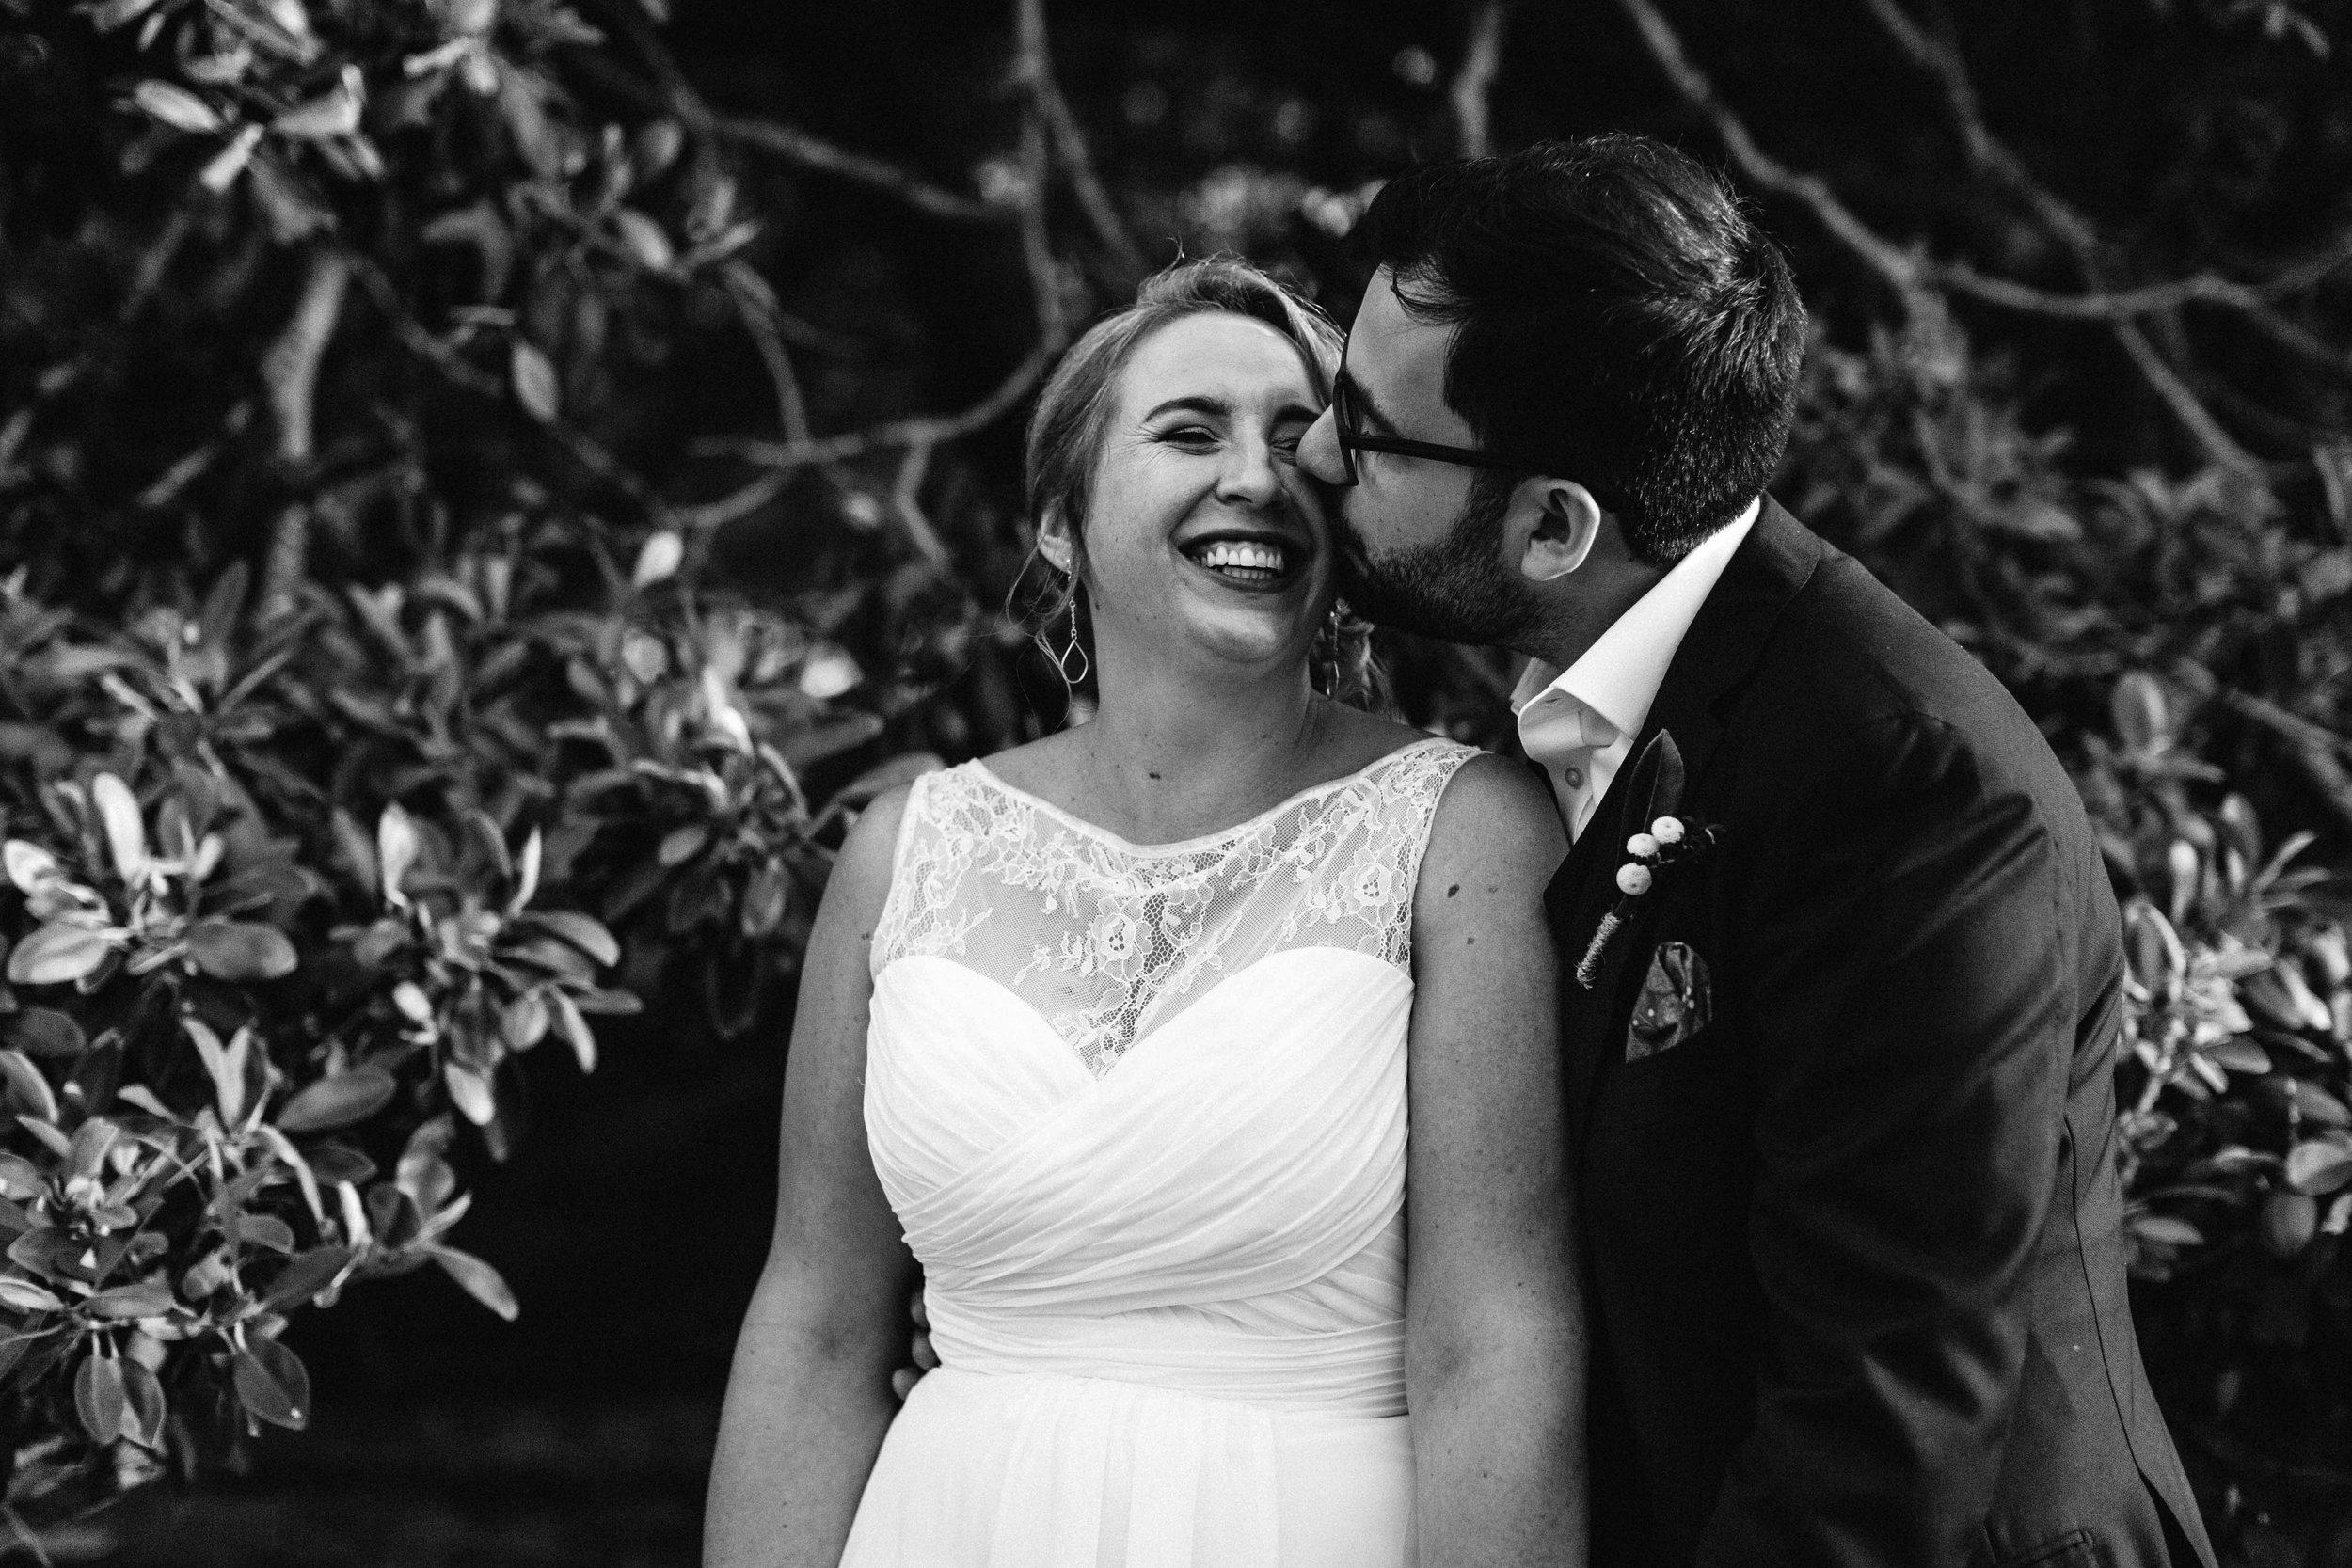 cabarita-park-sydney-wedding-emilyobrienphotography.net-58.jpg